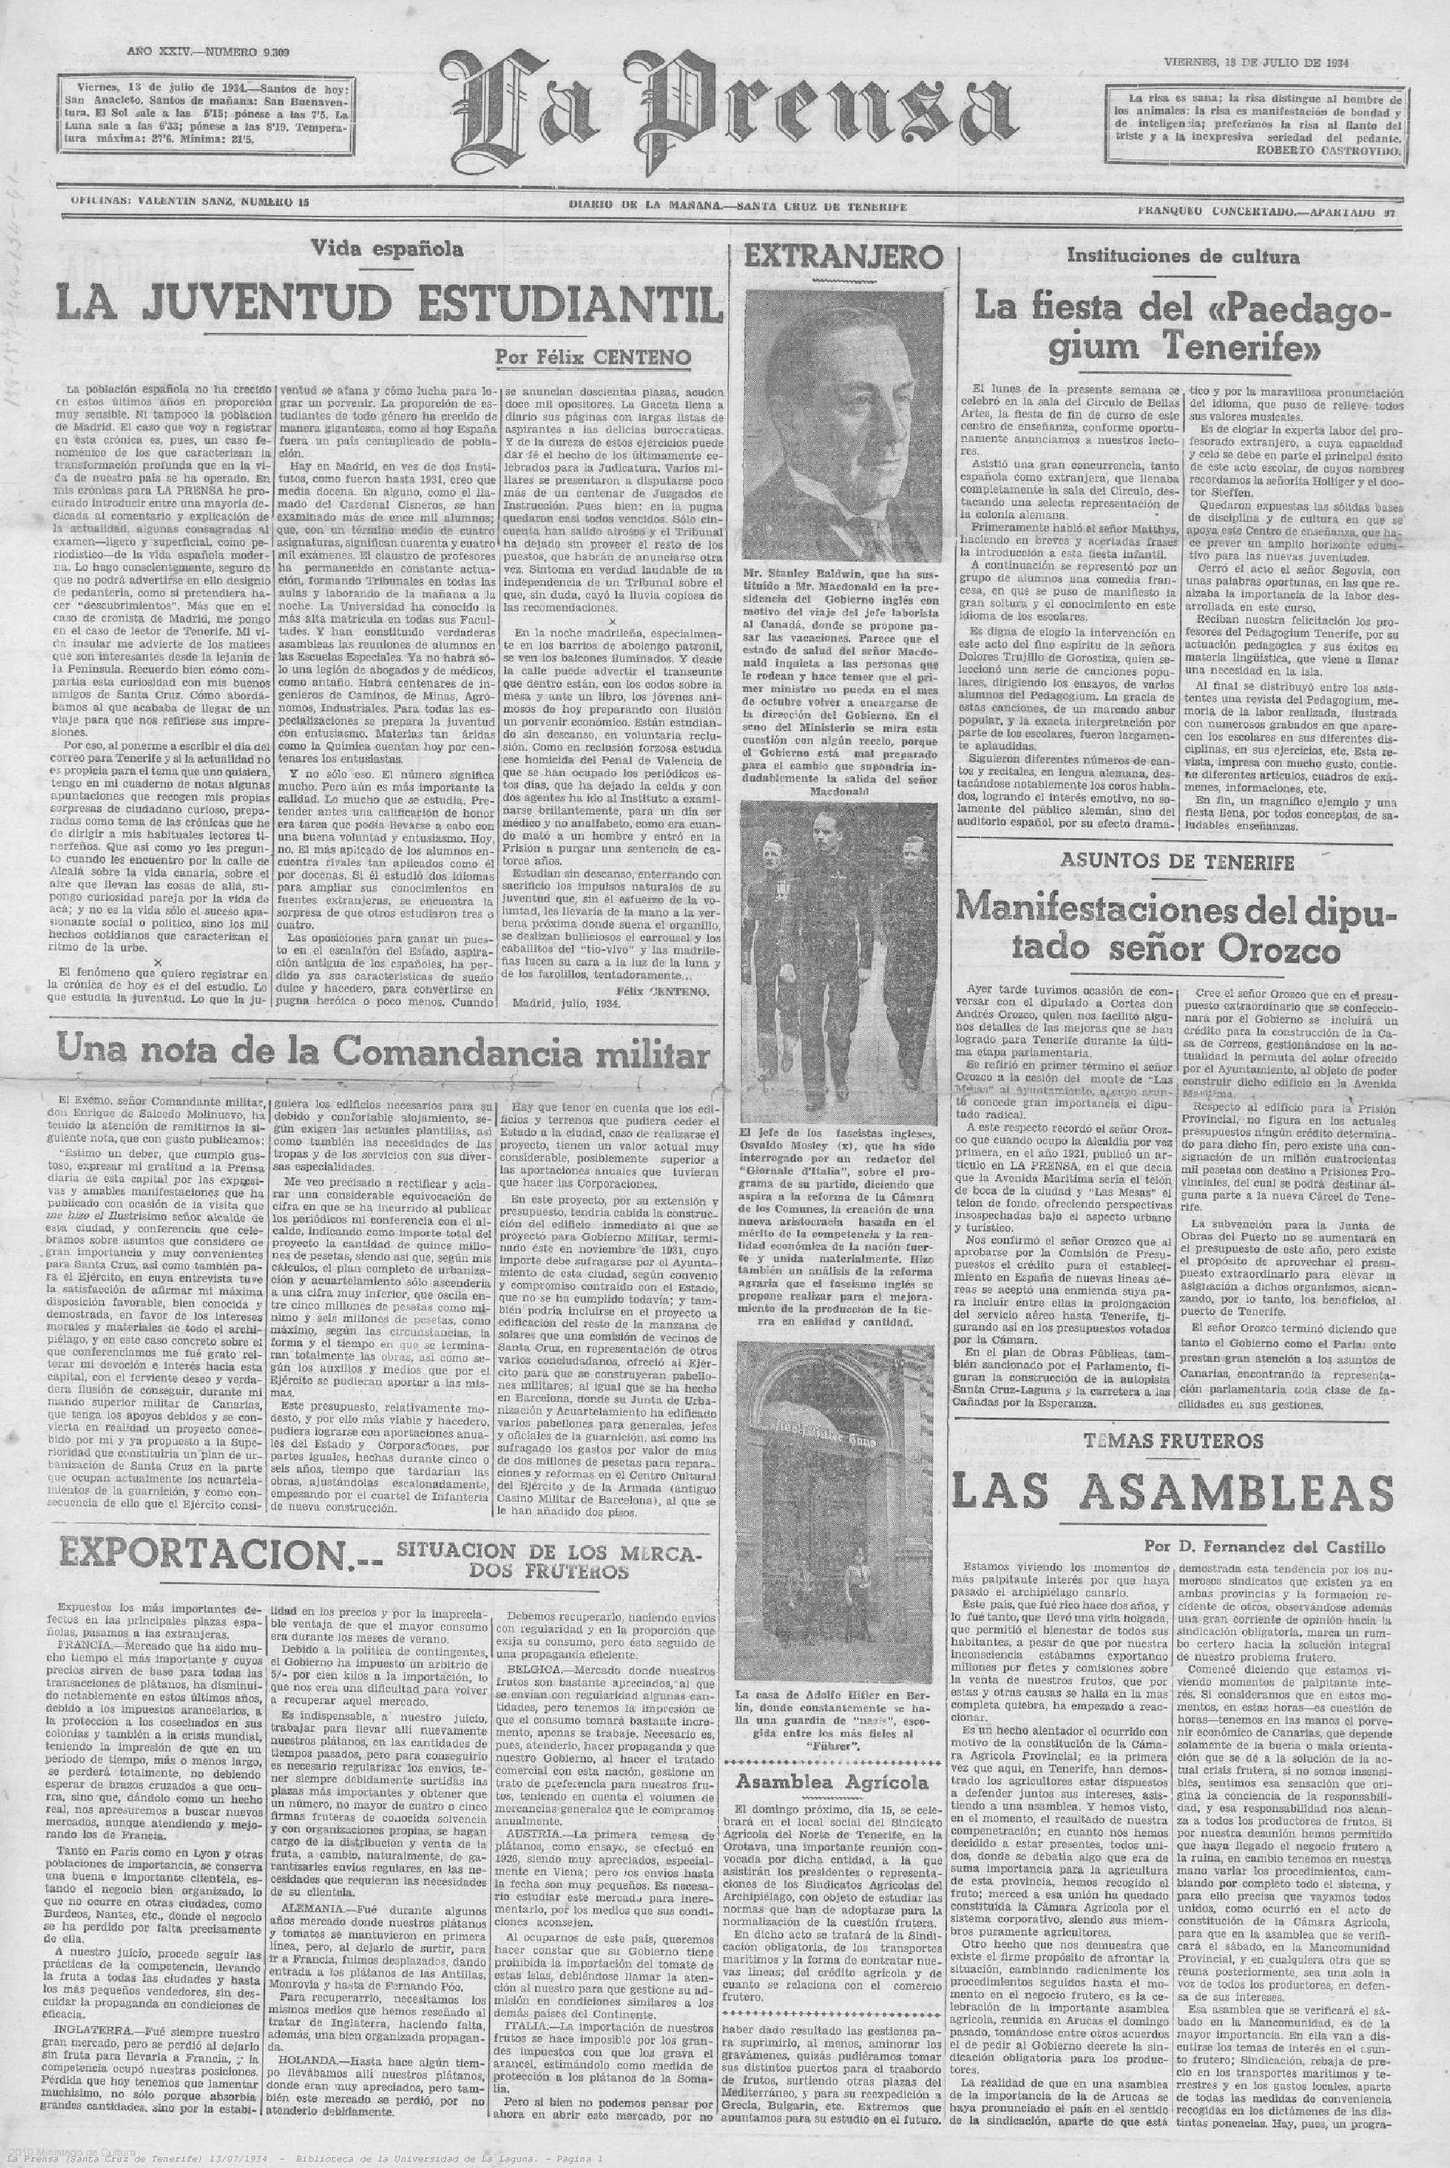 Calaméo - La Prensa 13 07 1934